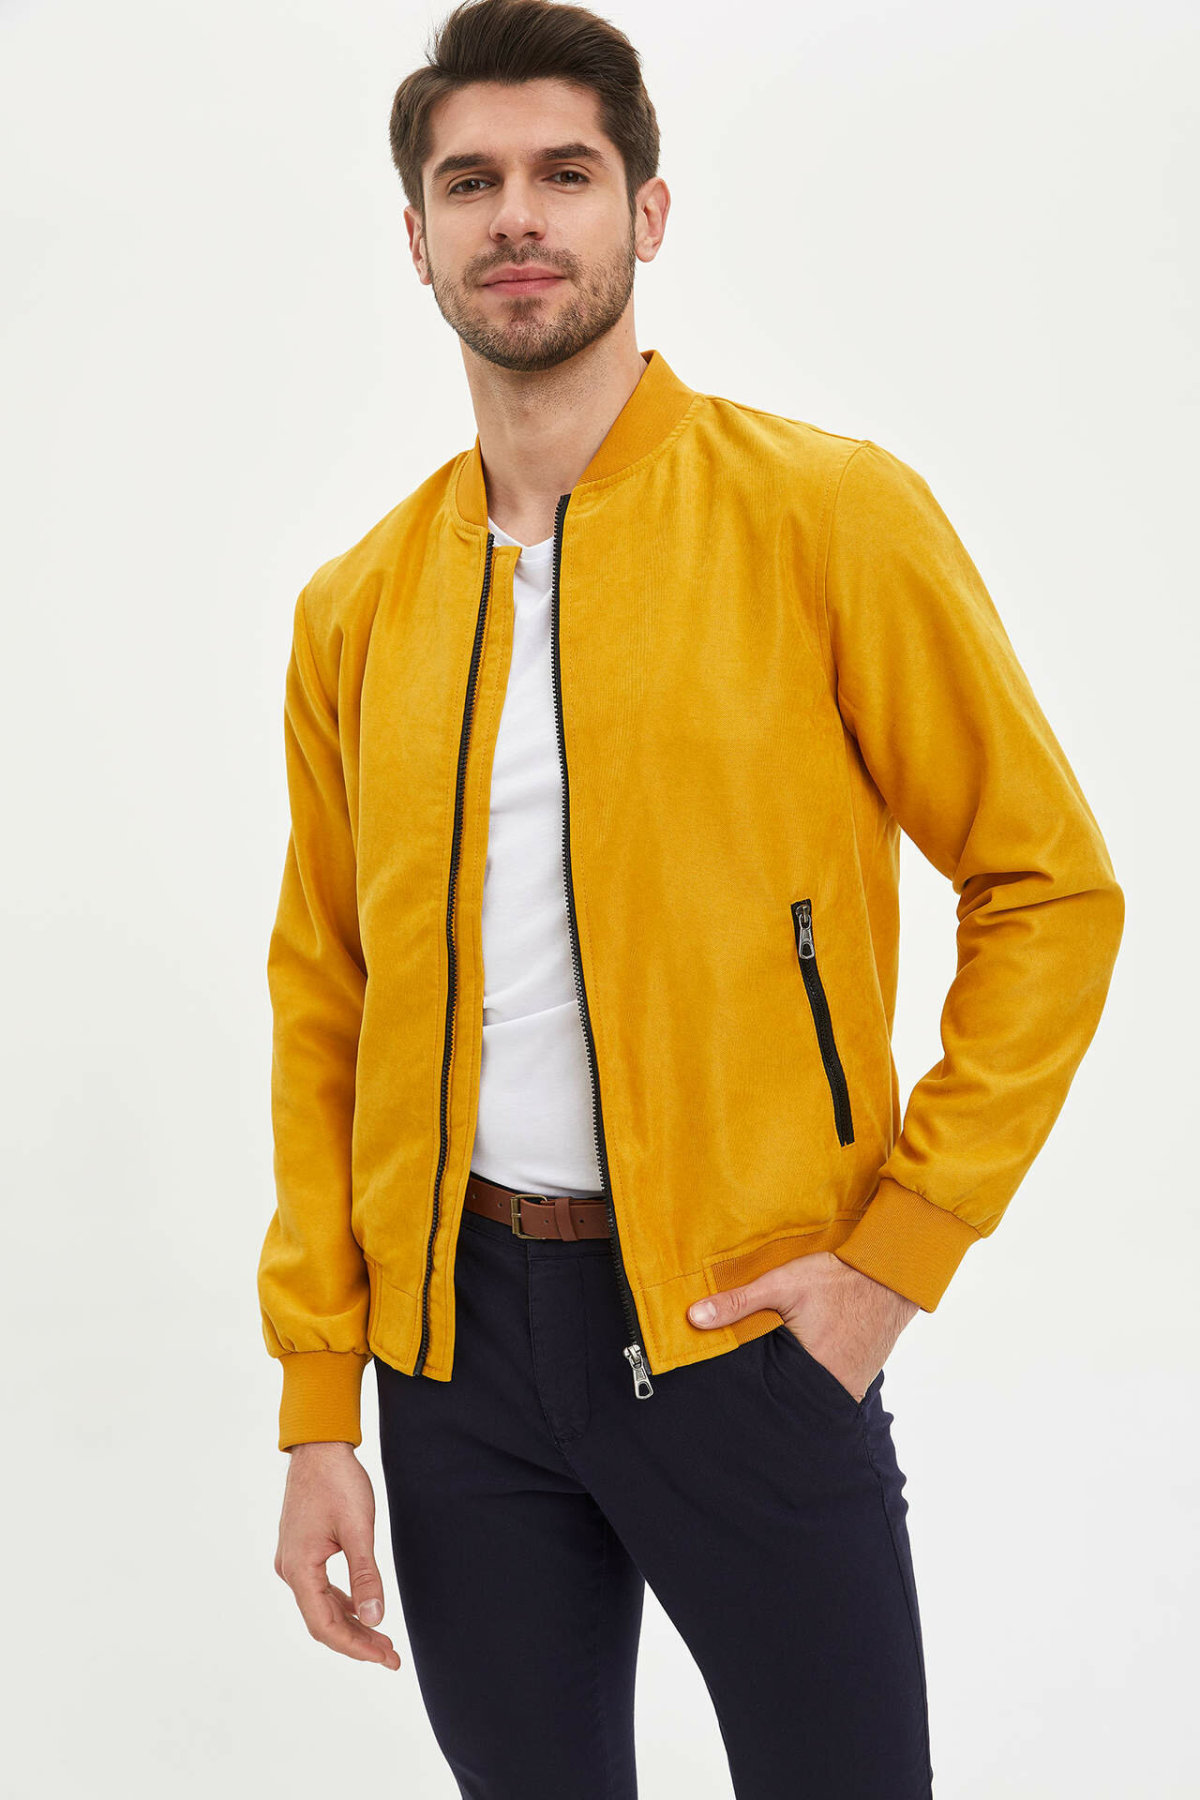 DeFacto Man Mont 탑 코트 남성 캐주얼 지퍼 코트 남성 봄 기본 컬러 자켓 남성 자켓 Coat-M3313AZ20SP